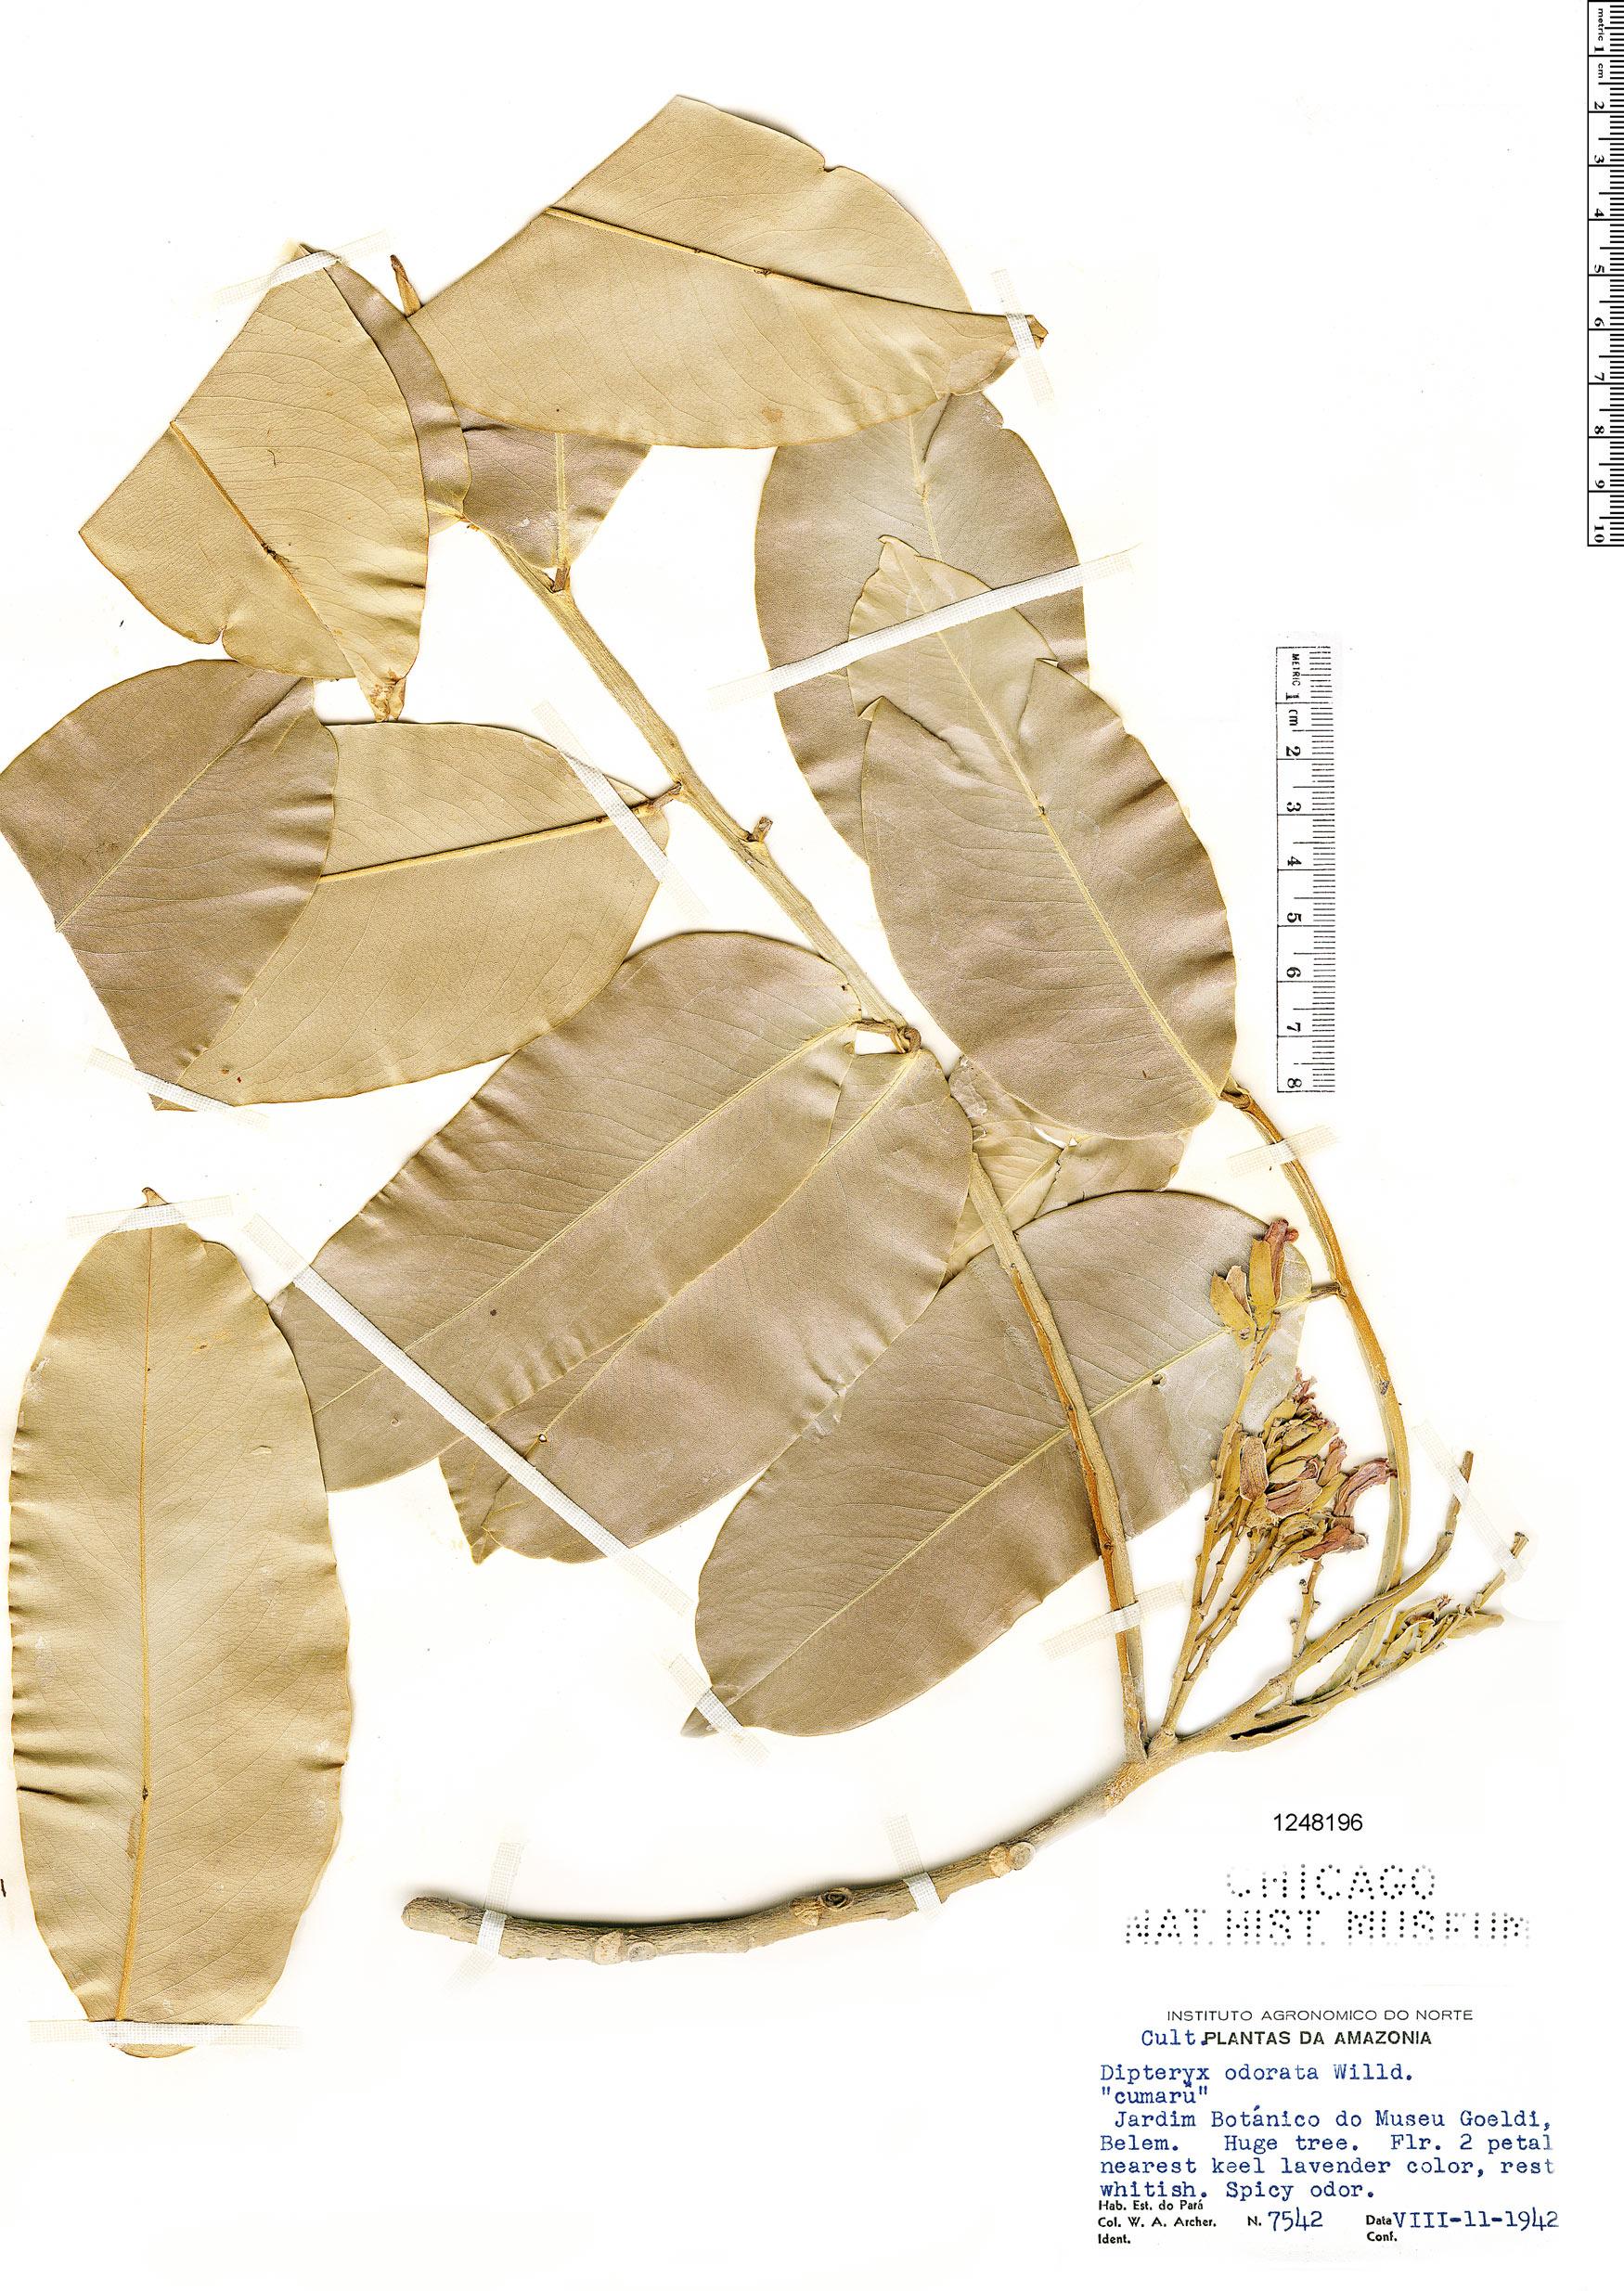 Specimen: Dipteryx odorata